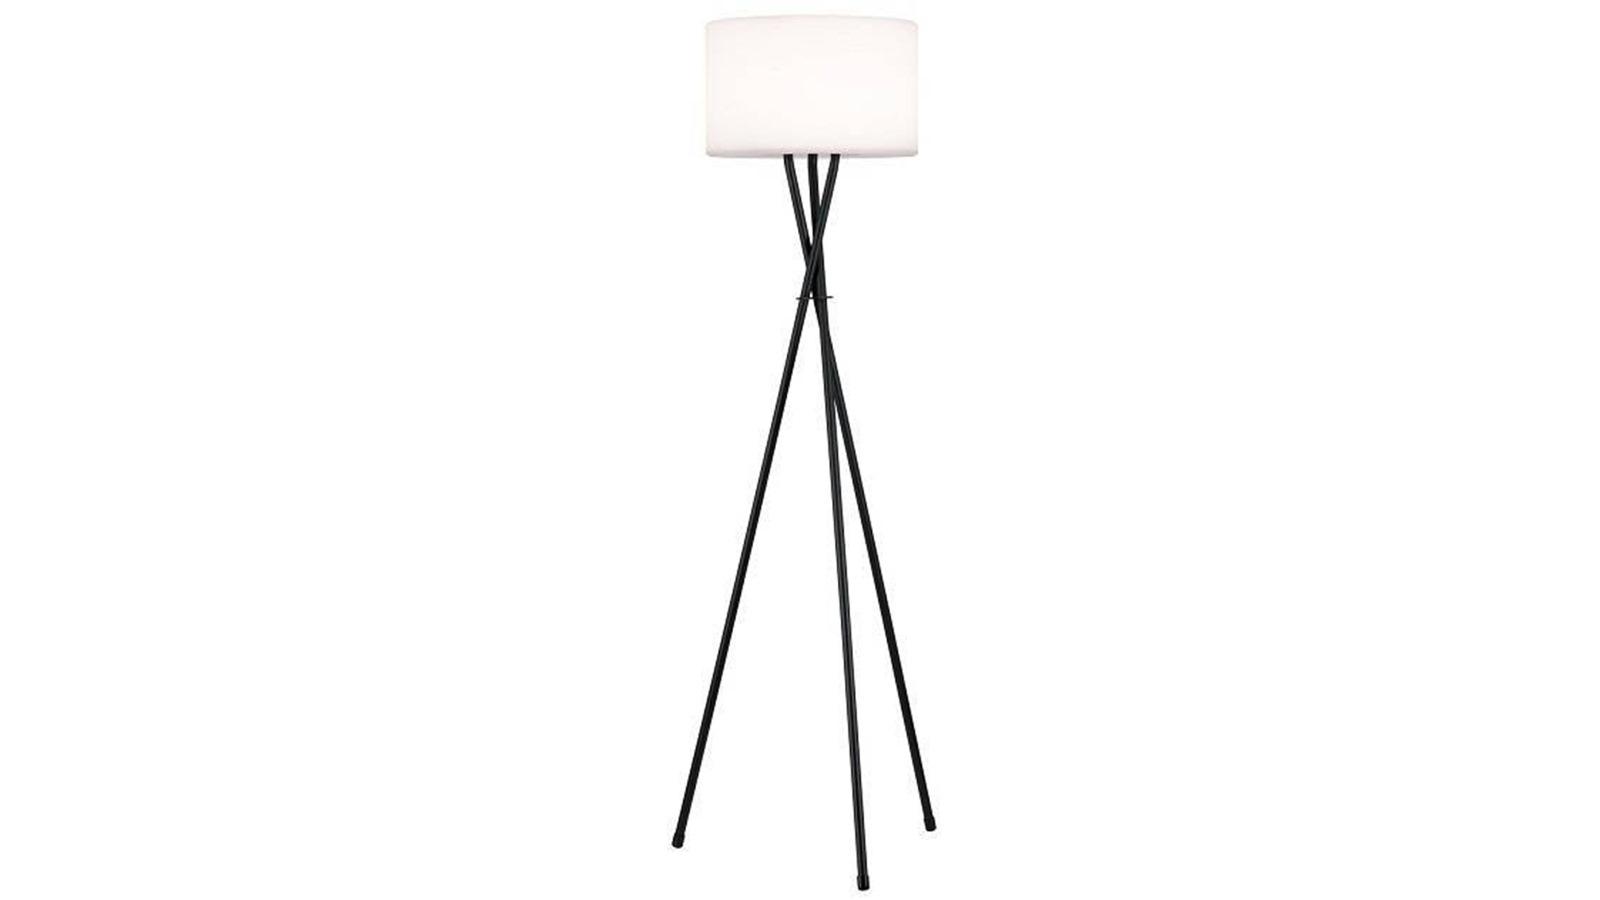 Buy Lexi Lighting 150cm Led Outdoor Floor Lamp Round Harvey Norman Au